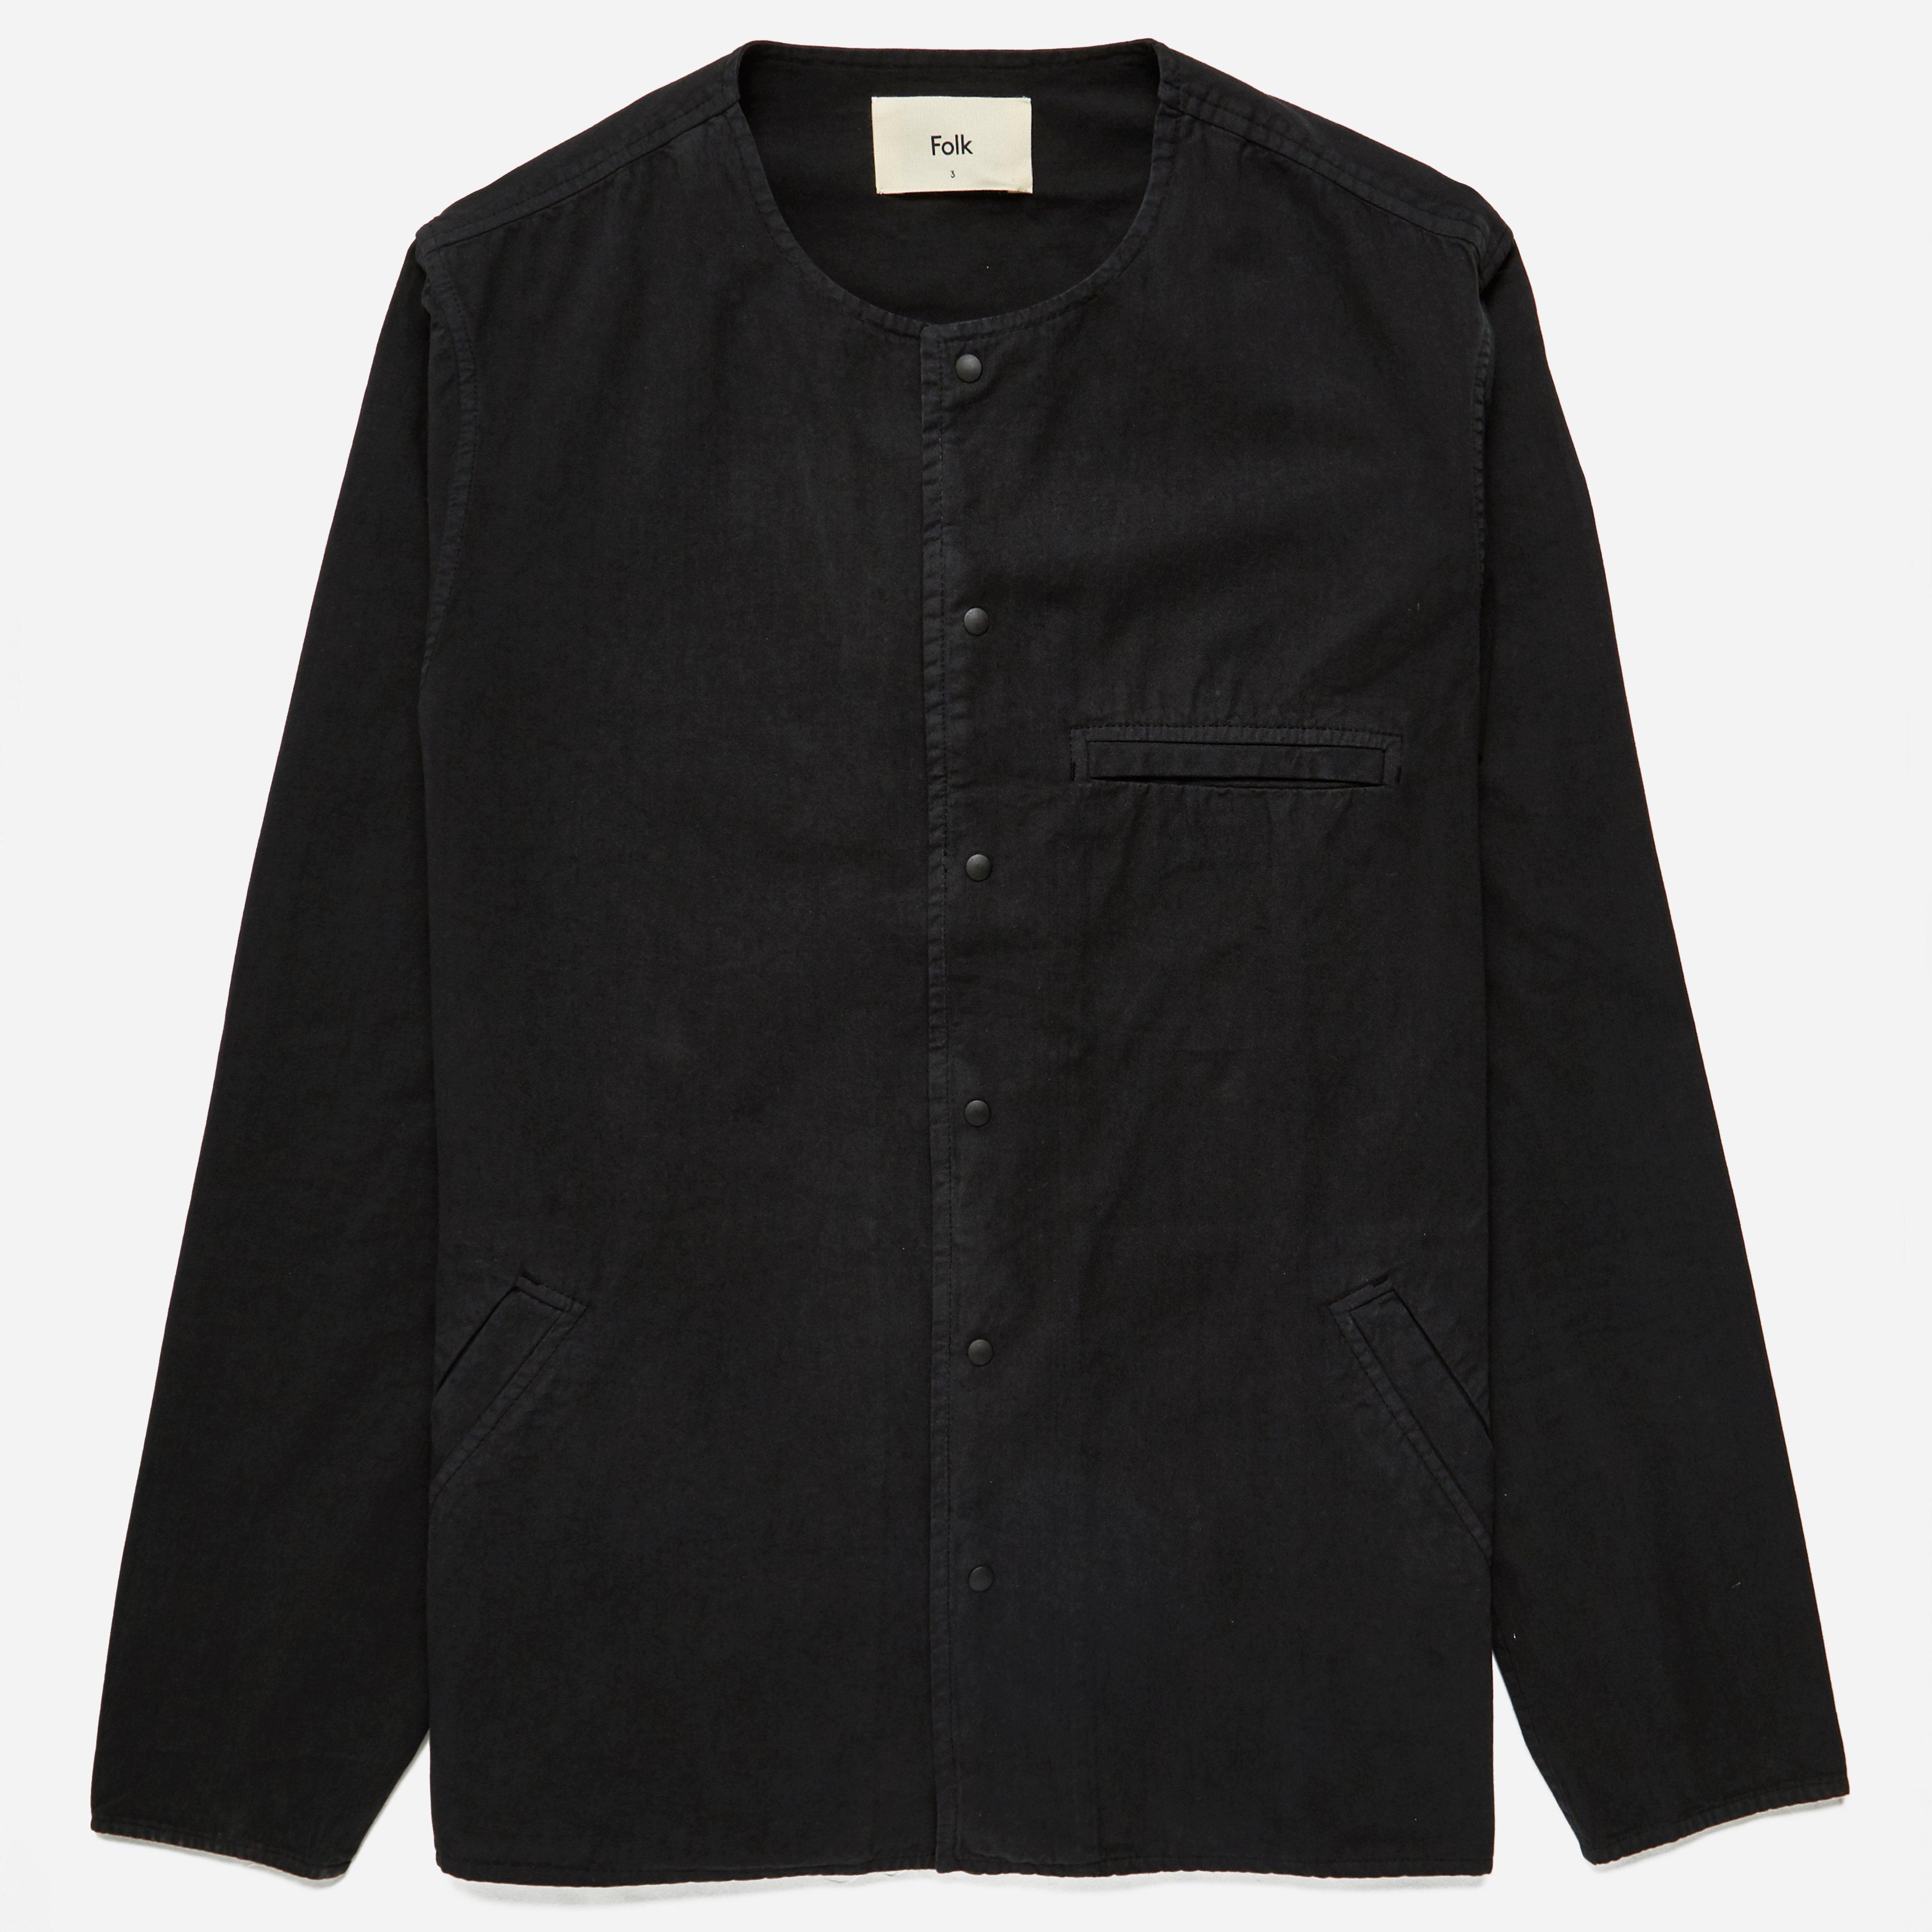 Folk Collarless Pop Stud Shirt